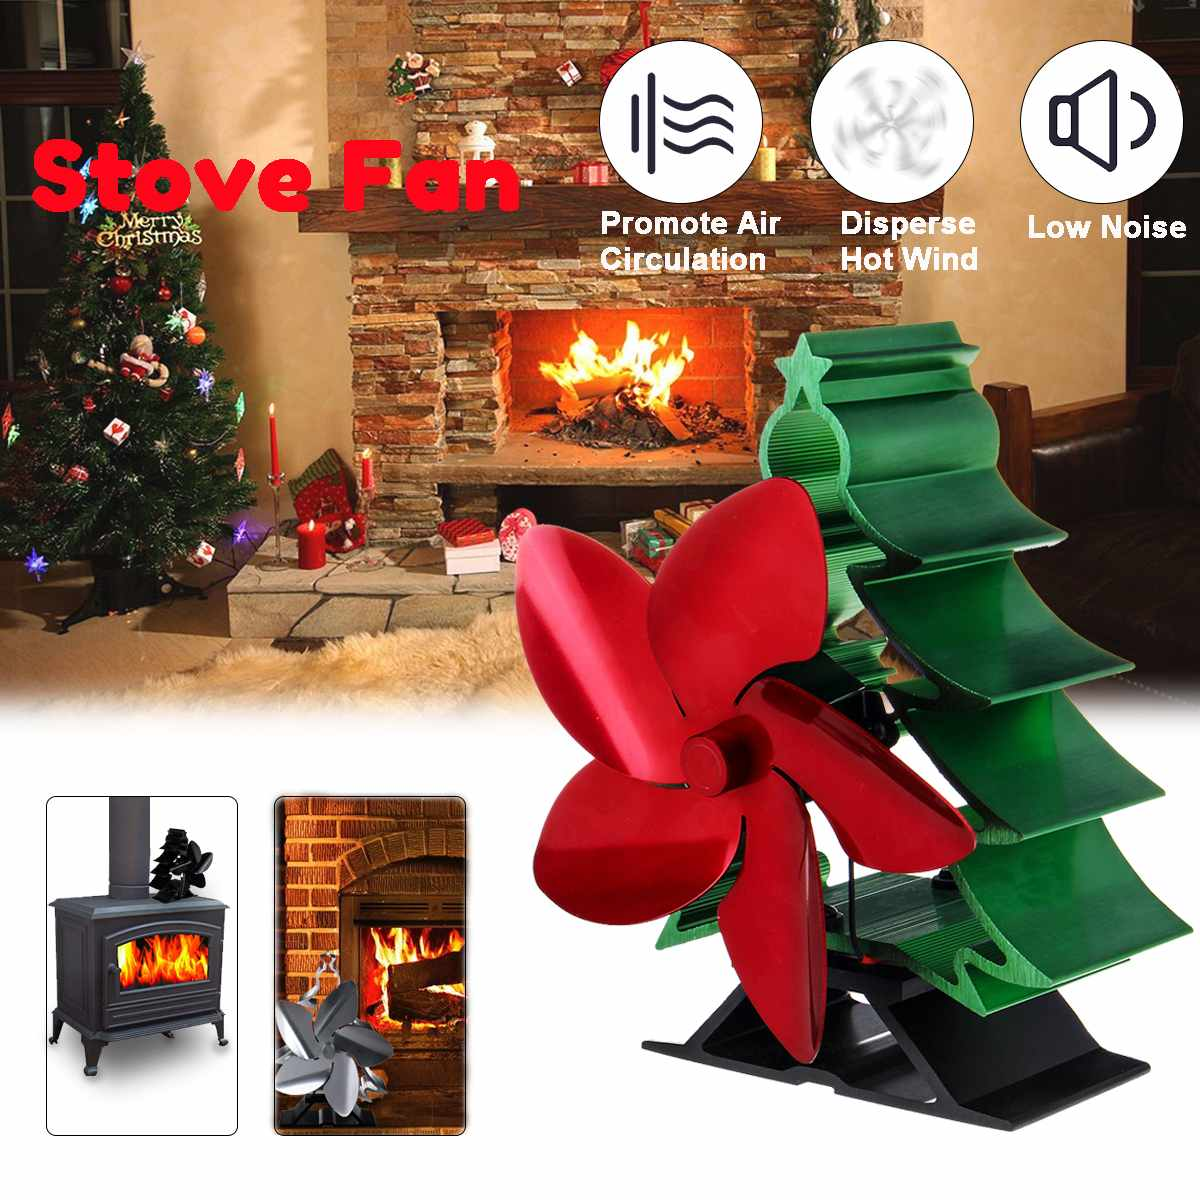 Fireplace Heat Powered Komin Christmas Tree Shape 5 Blade Stove Fan Home Efficient Eco Friendly Wood Burner Fan 180CFM 5 Blade